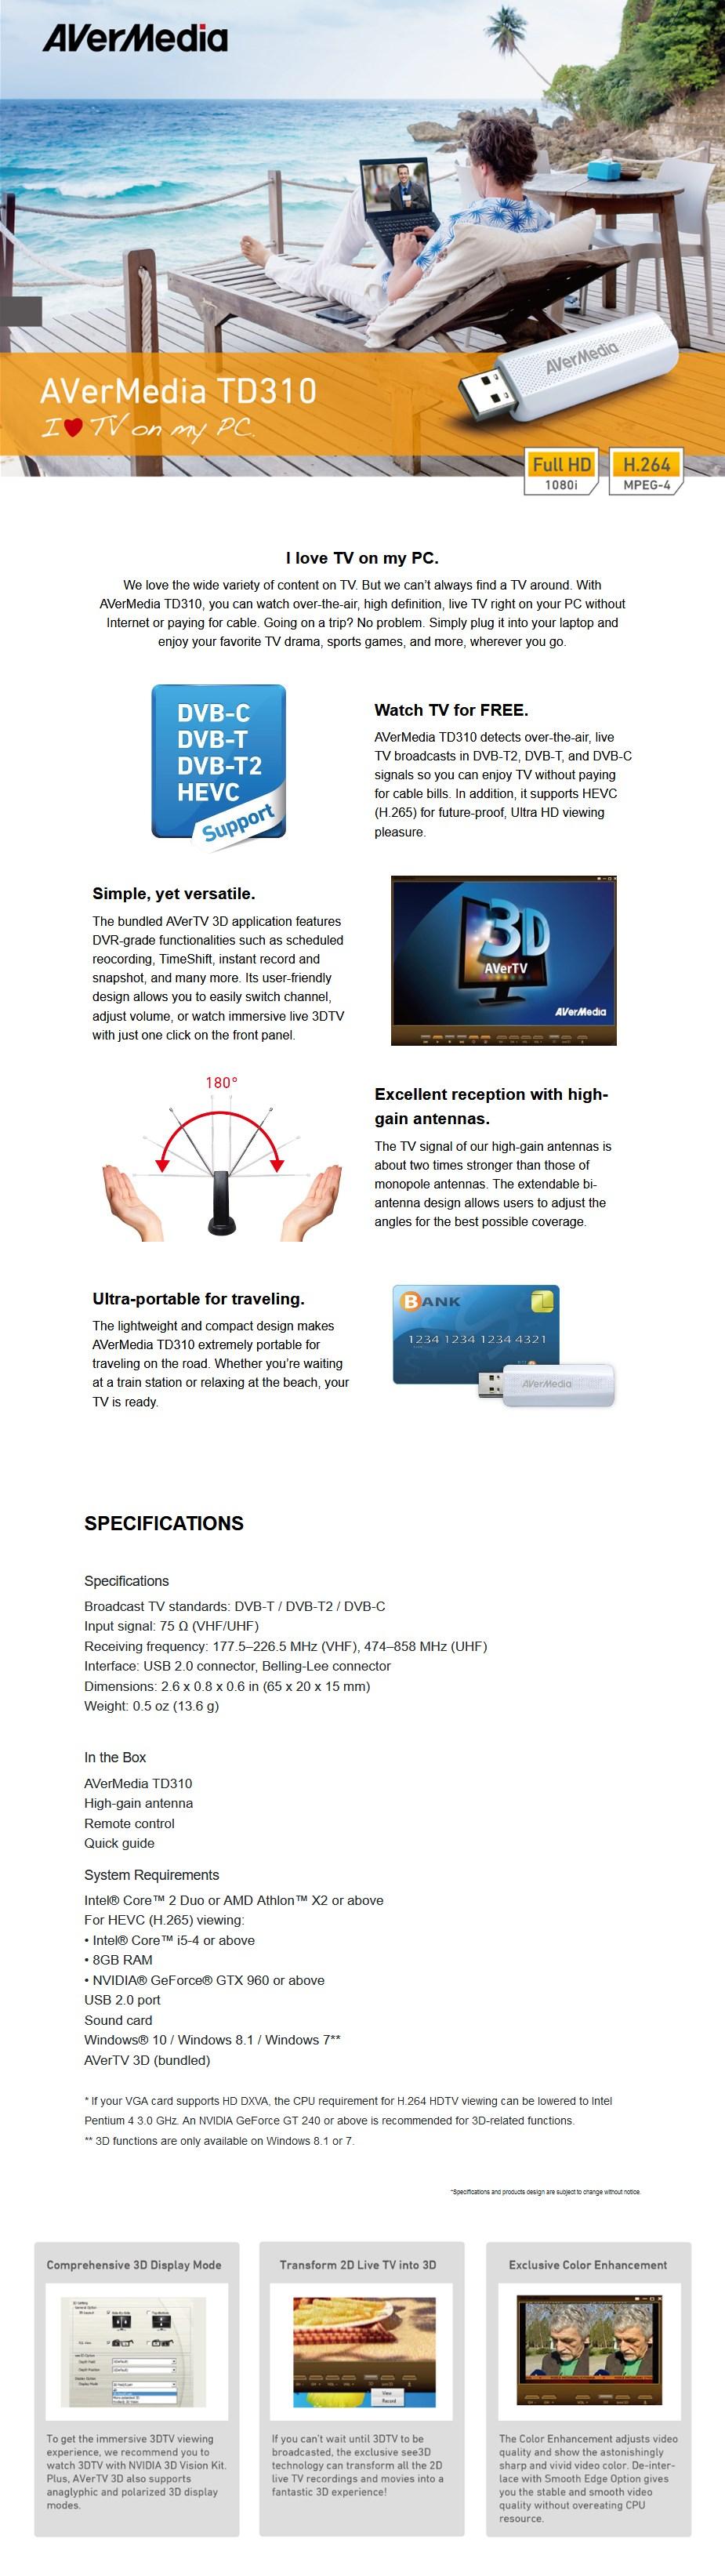 AVerMedia TD310 Pure Digital DVB T2 TV Tuner - Overview 1